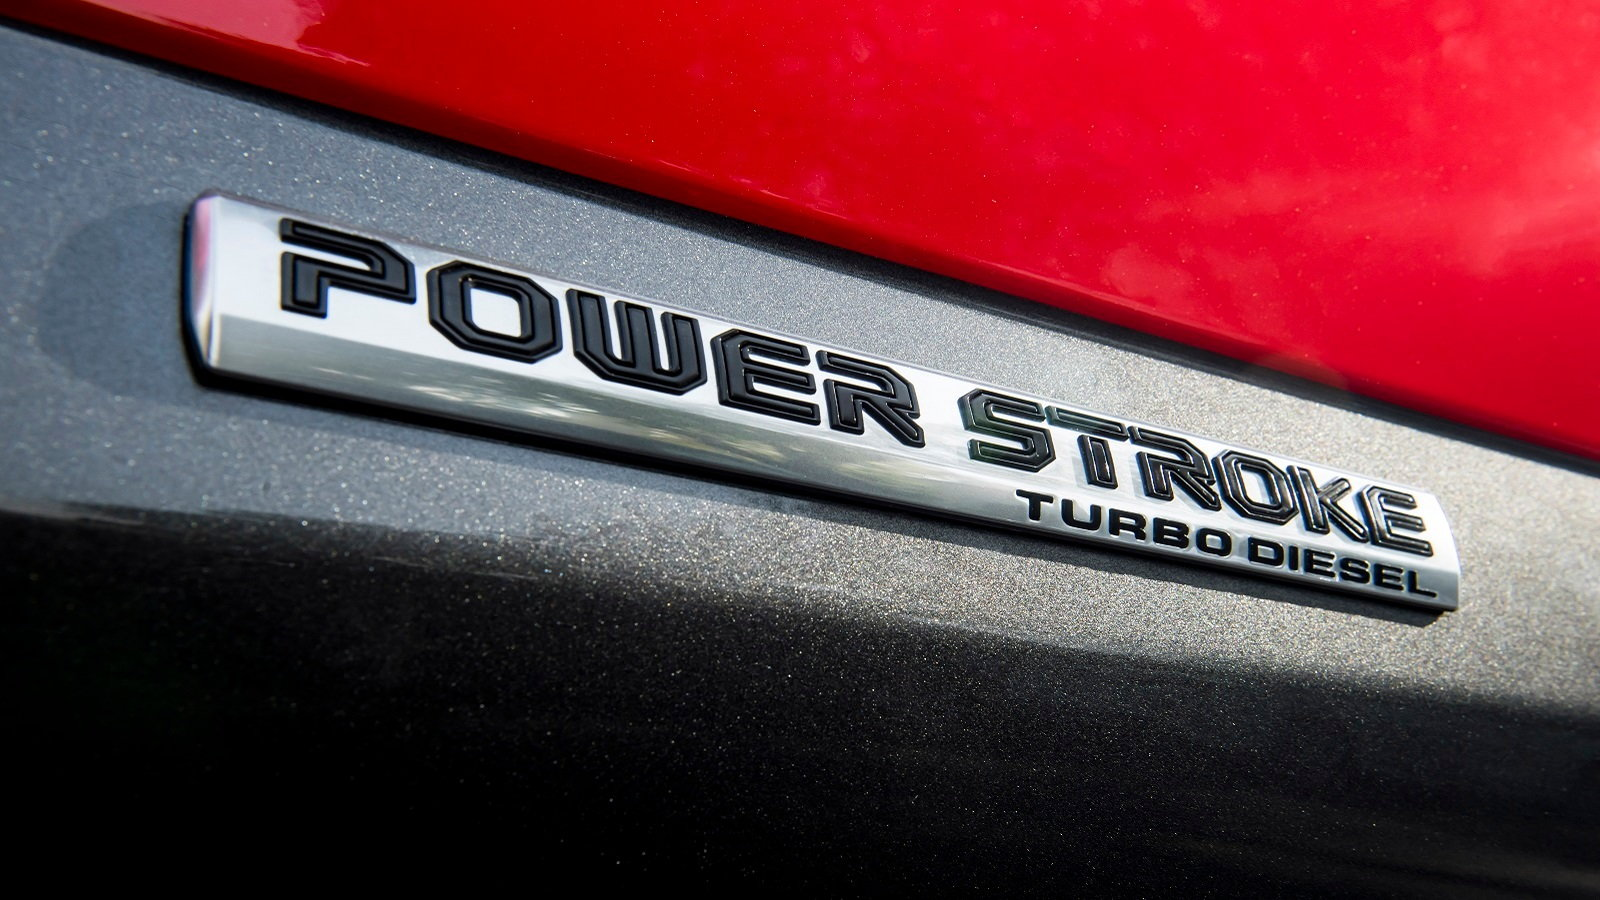 2018 Diesel Ford F-150 Power Stroke